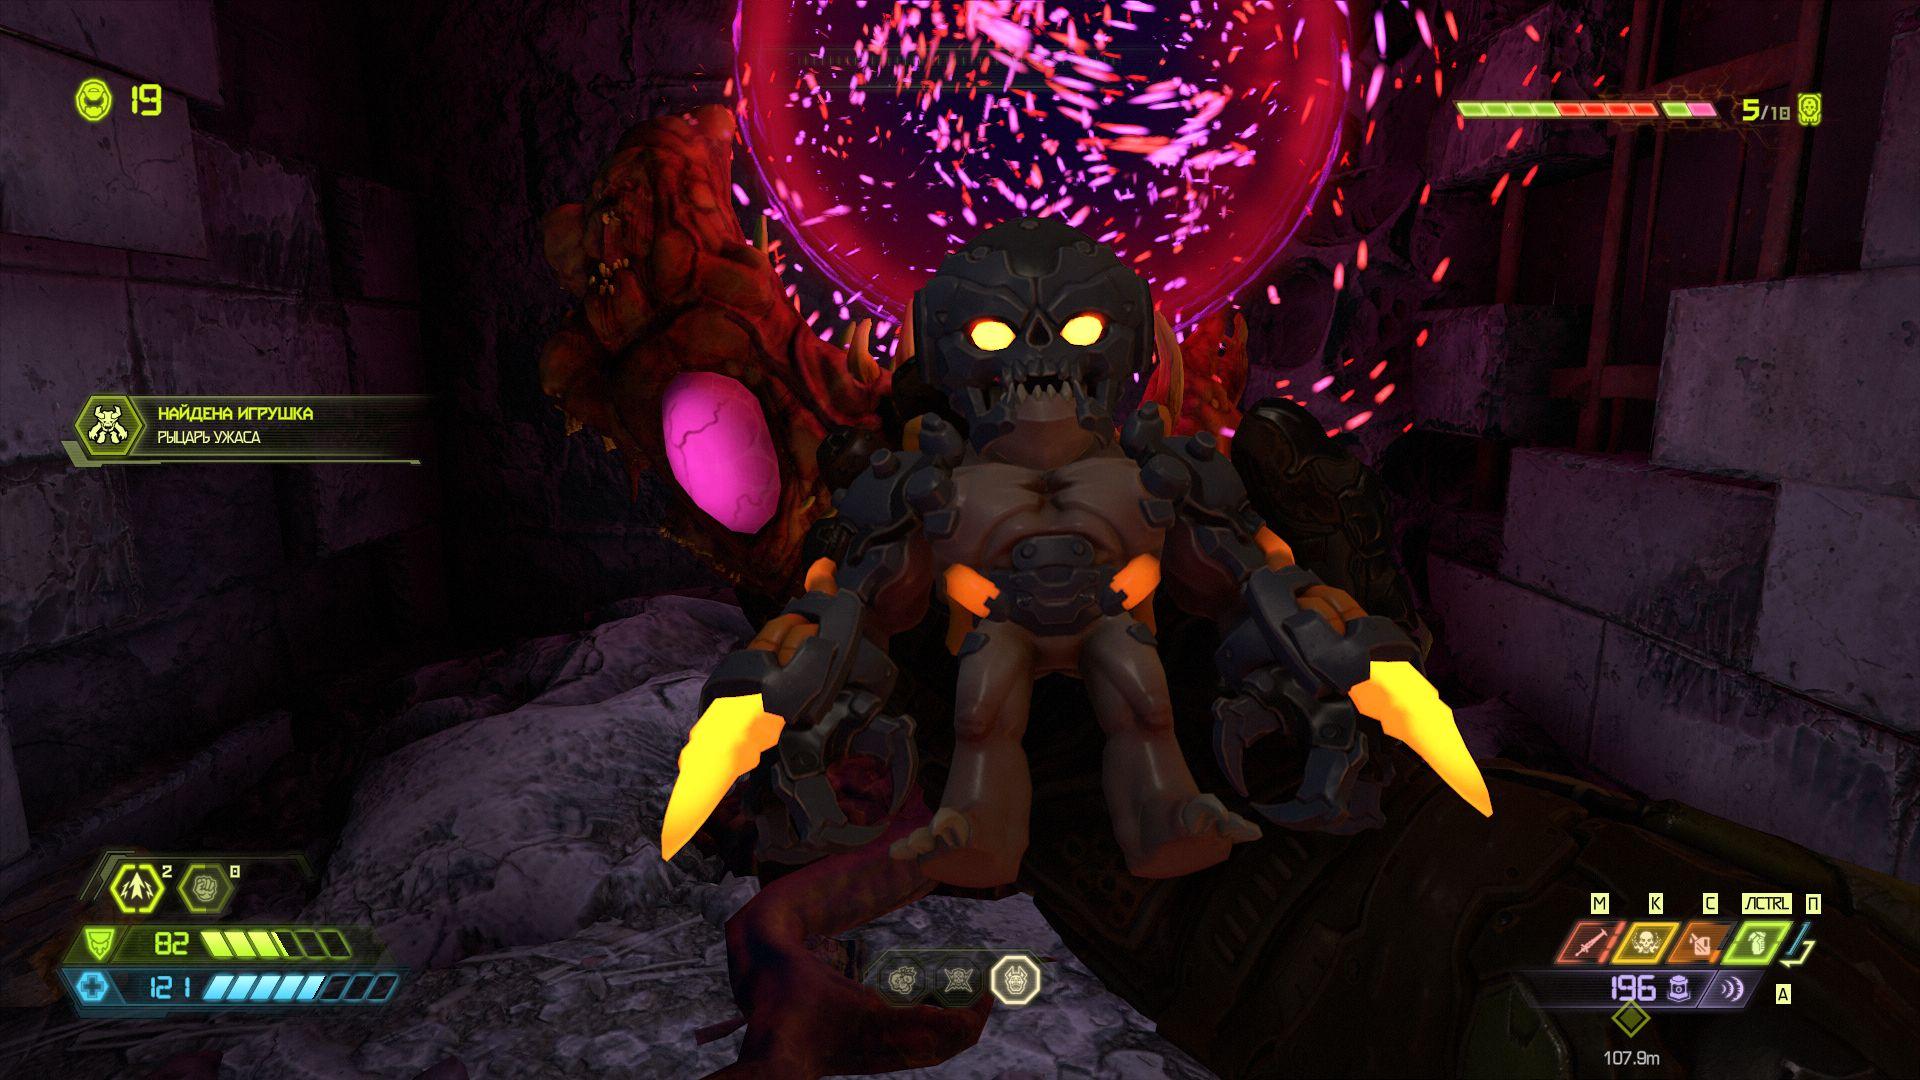 000162.Jpg - Doom Eternal